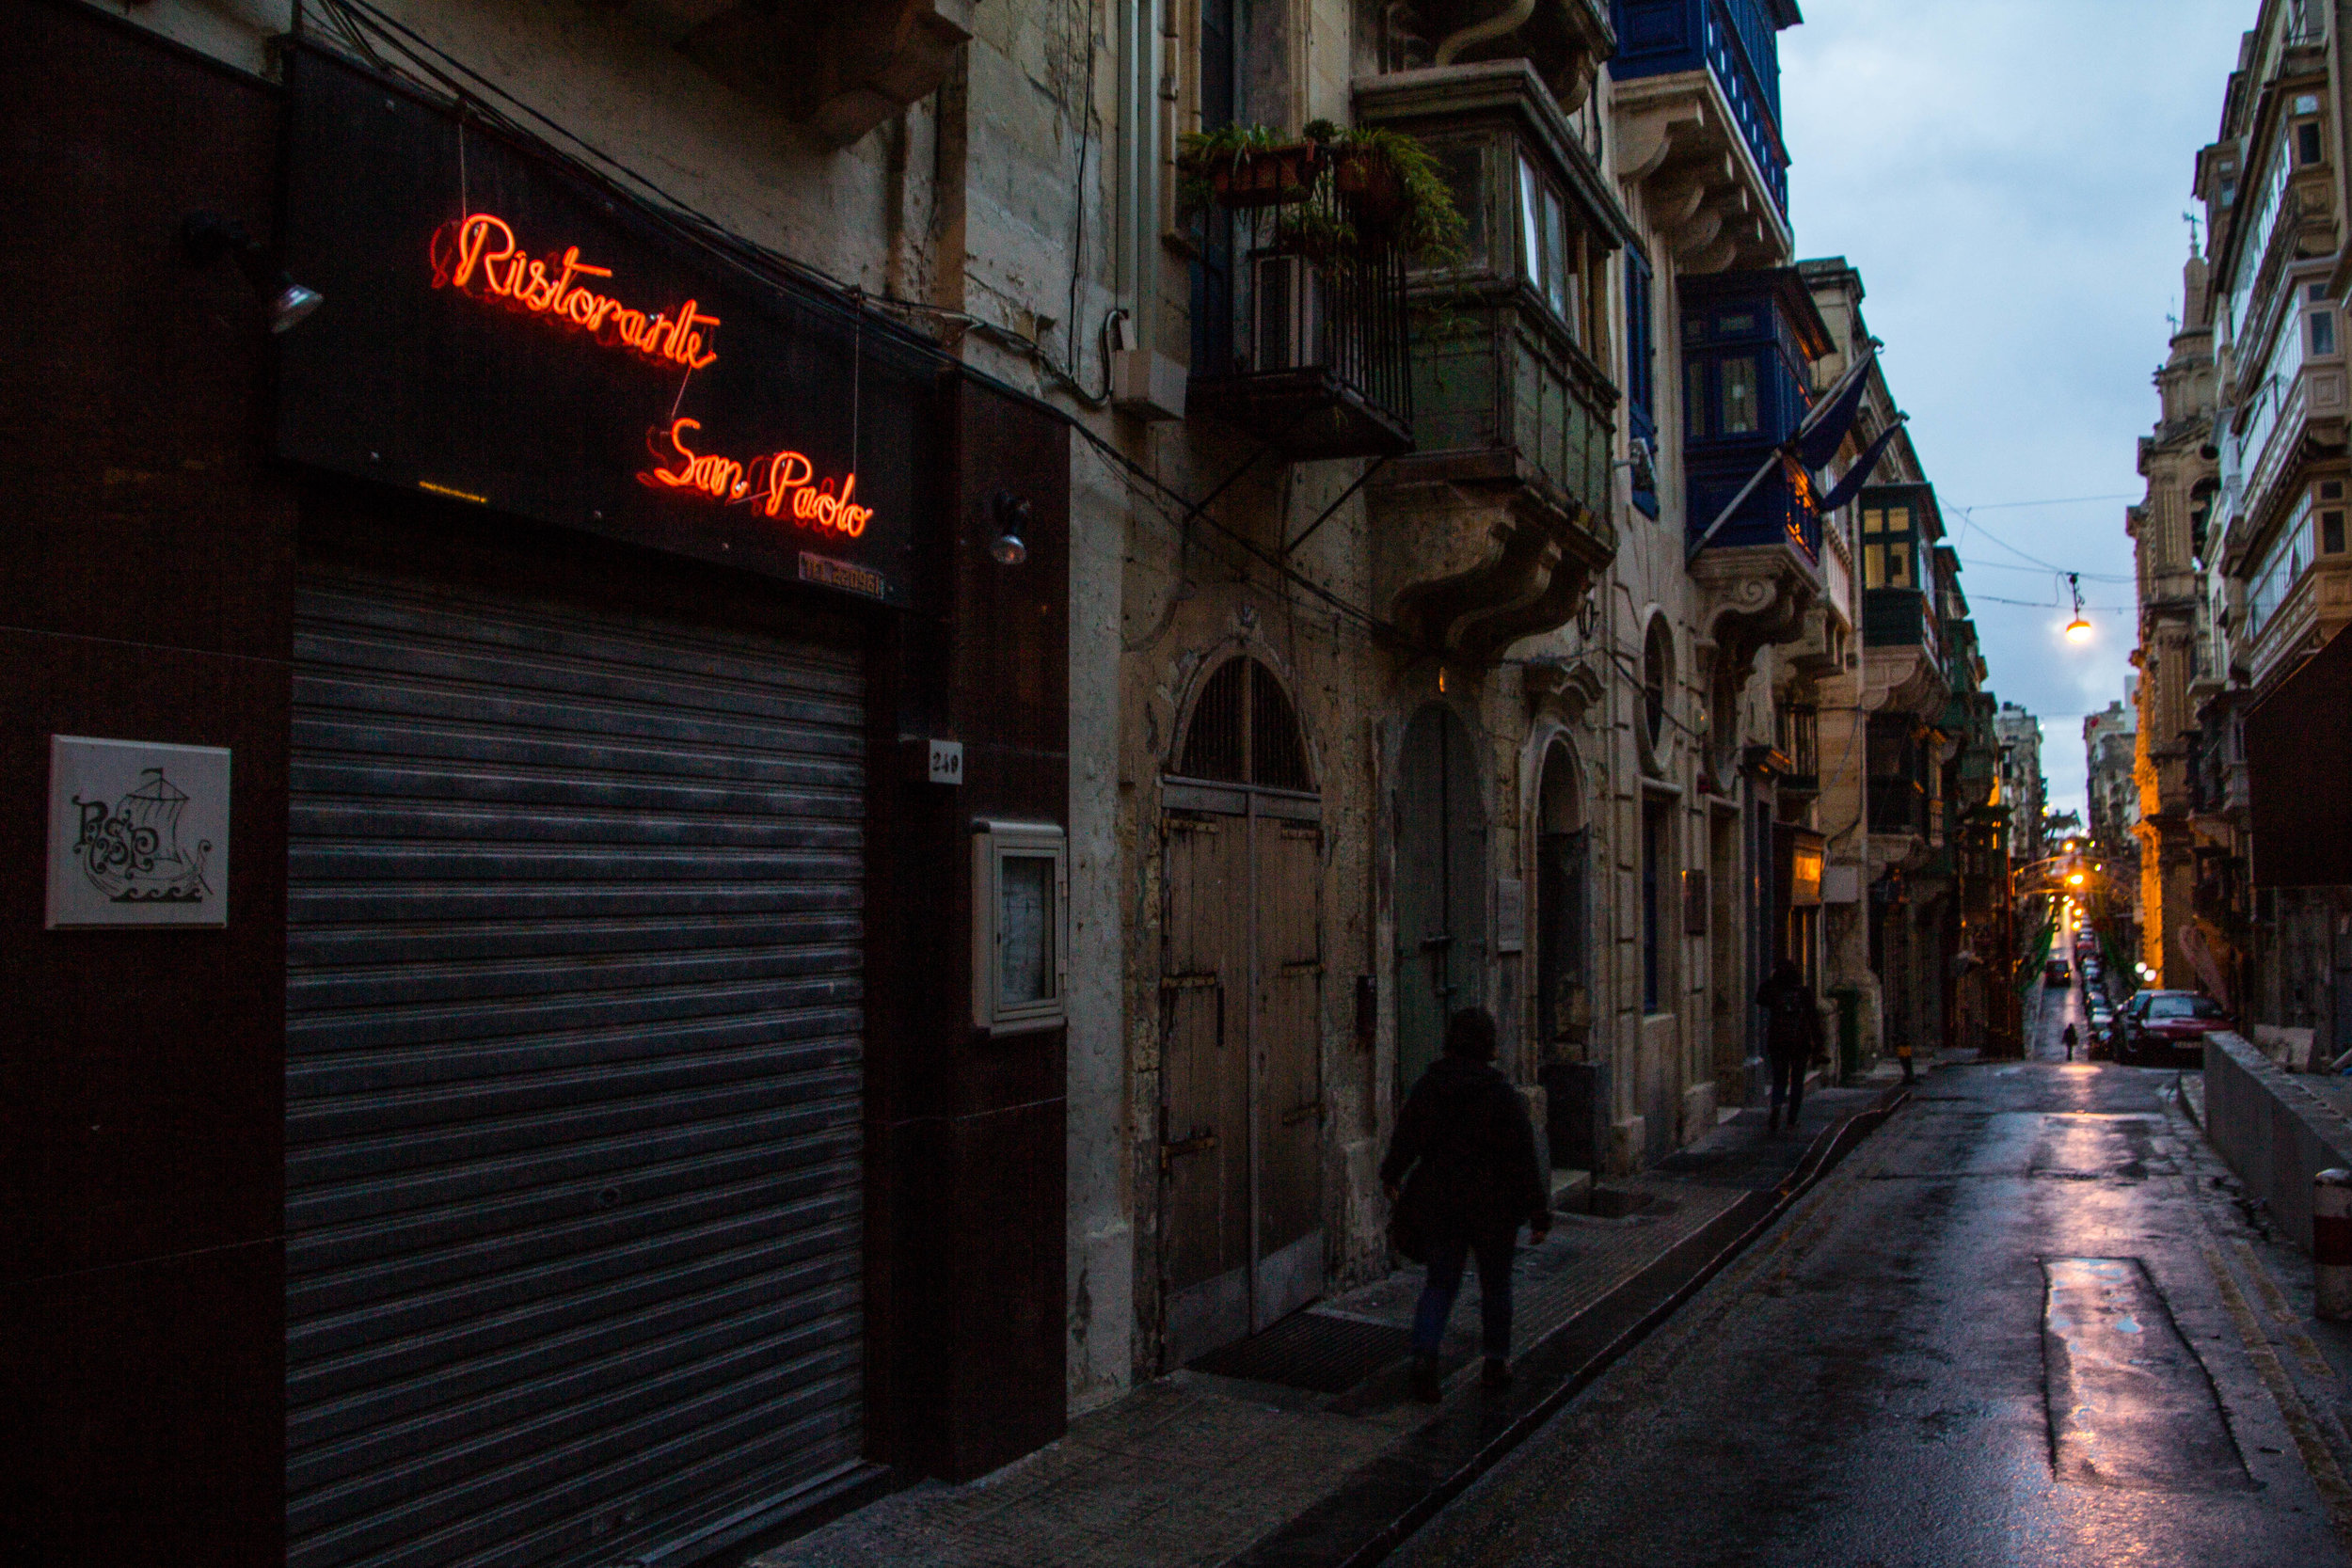 valletta-malta-clouds-rain-streets-photography-60.jpg